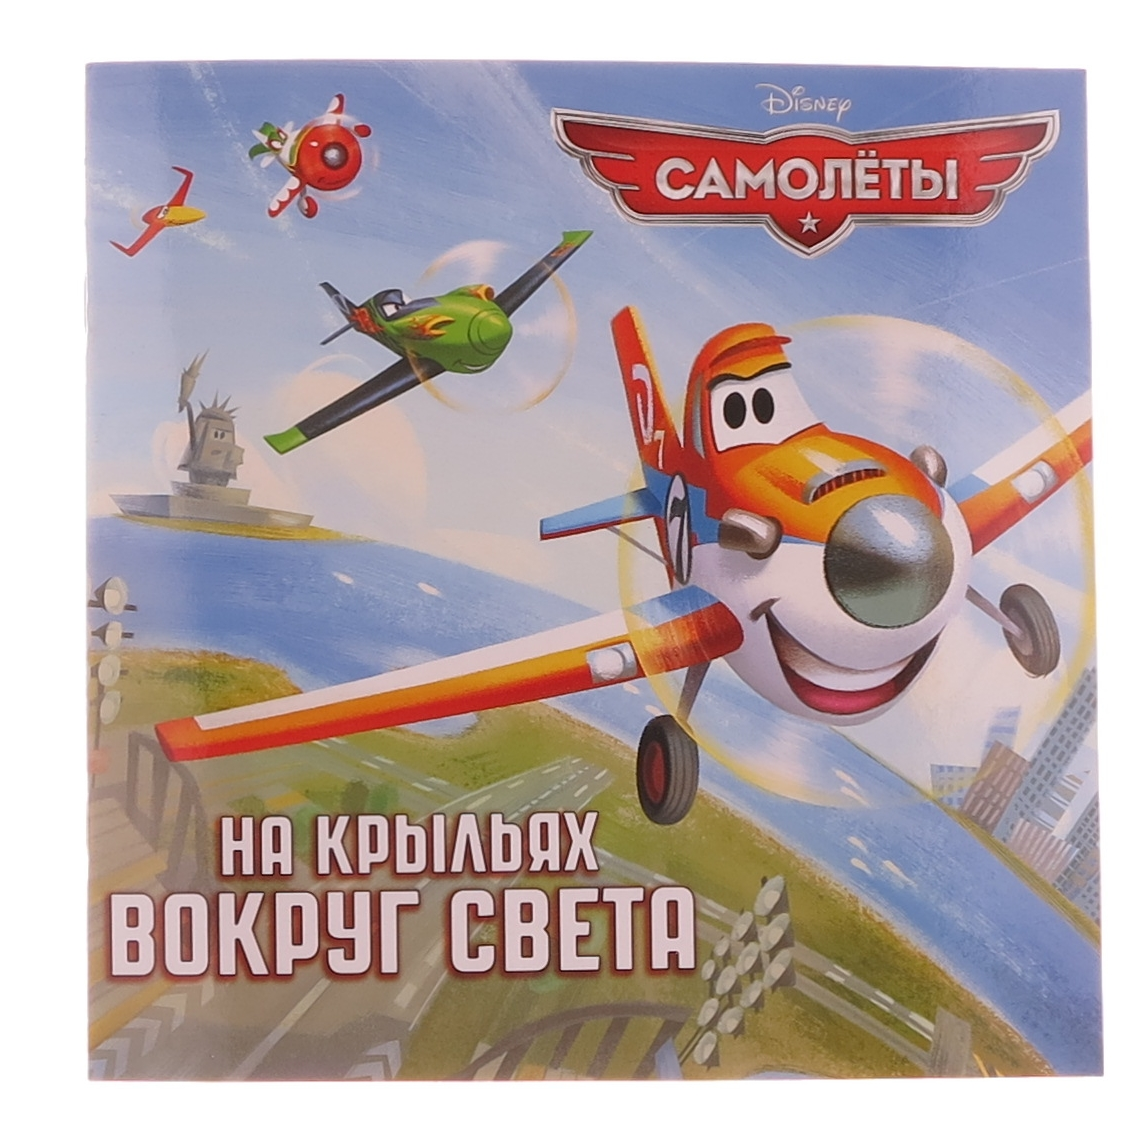 Самолёты. На крыльях вокруг света. Книжка-квадратПочитай мне сказку<br>Самолёты. На крыльях вокруг света. Книжка-квадрат<br>